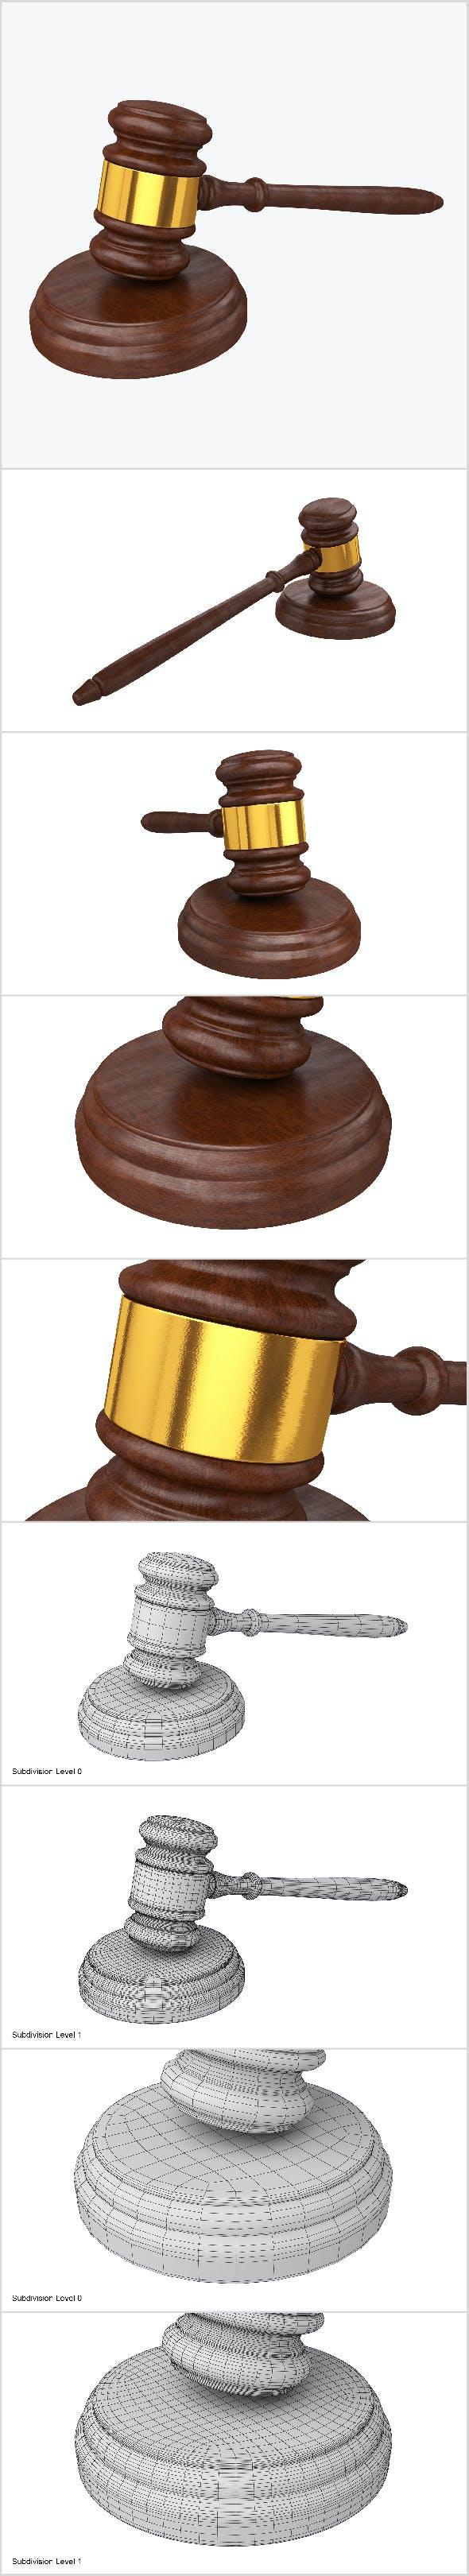 Judge Gavel - 3DOcean Item for Sale